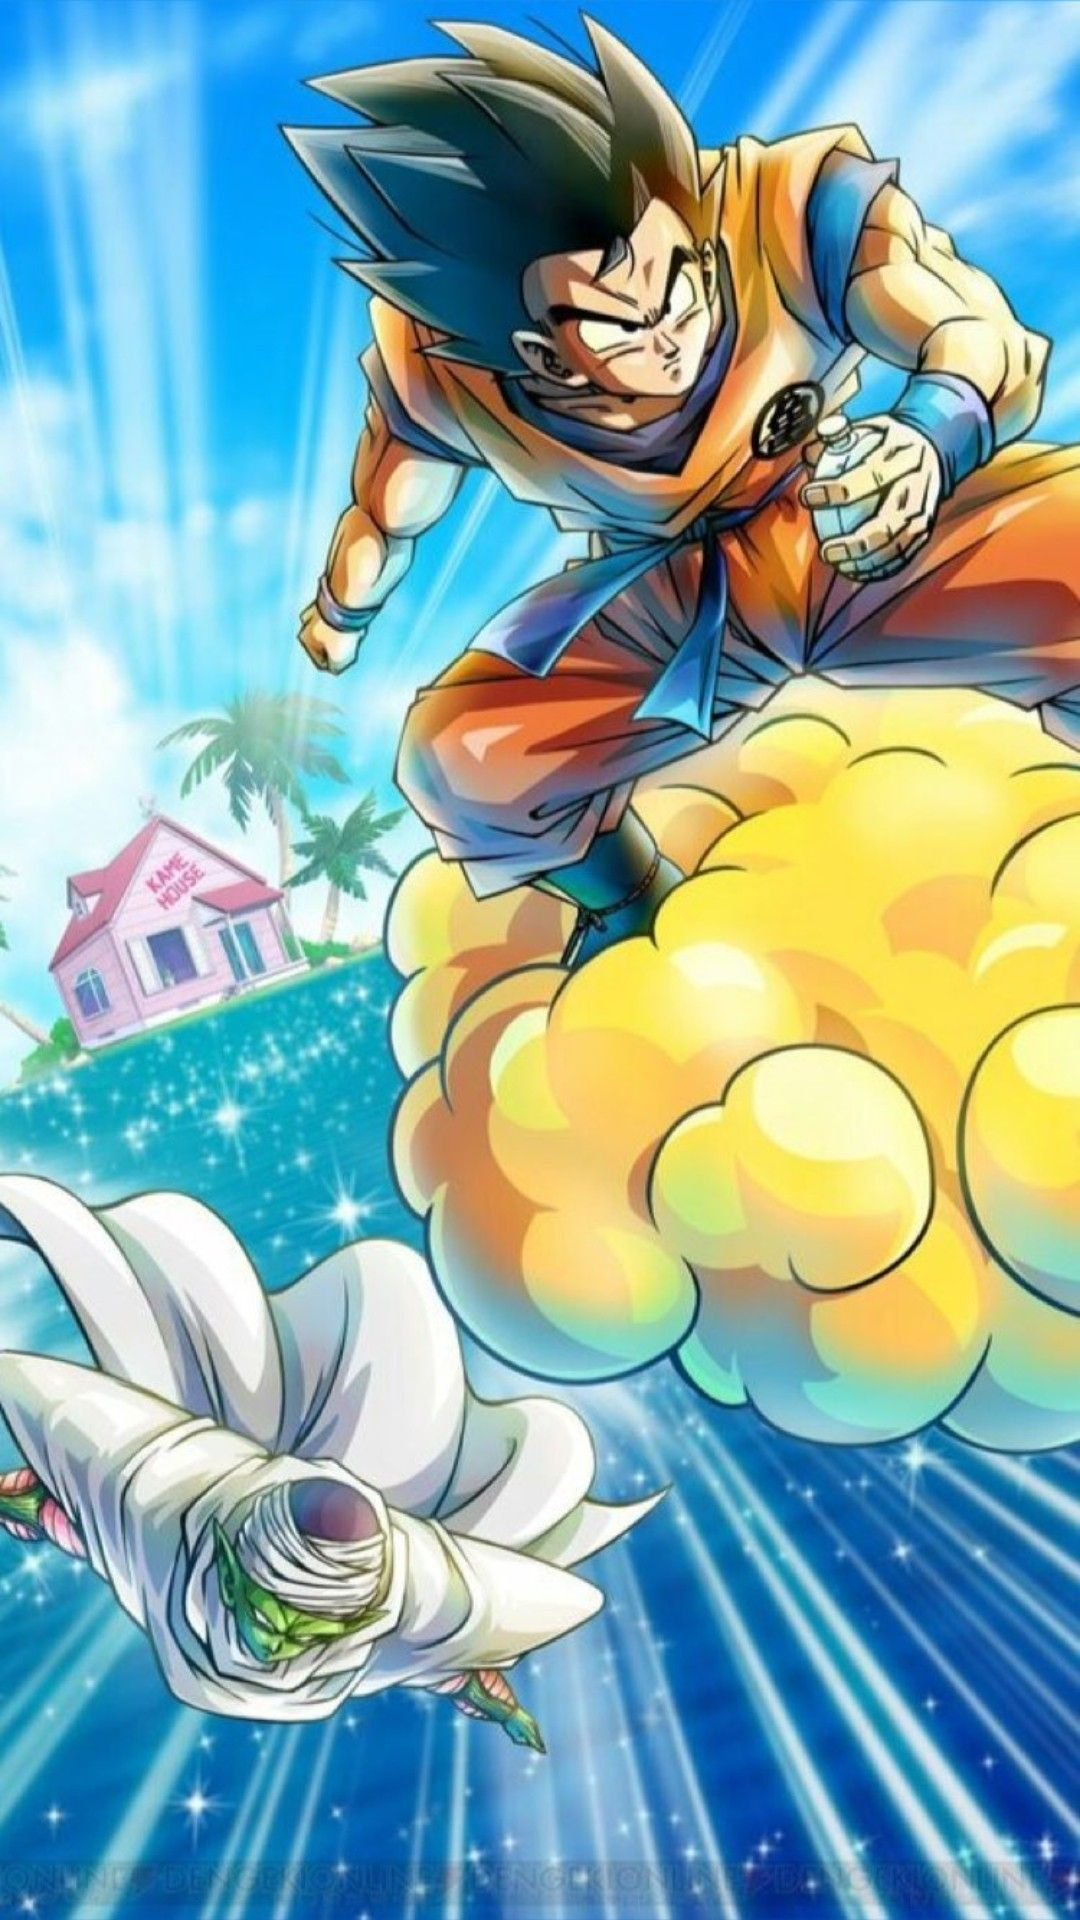 Pin By Driko On Dragonball Super Dragon Ball Goku Dragon Ball Z Dragon Ball Art